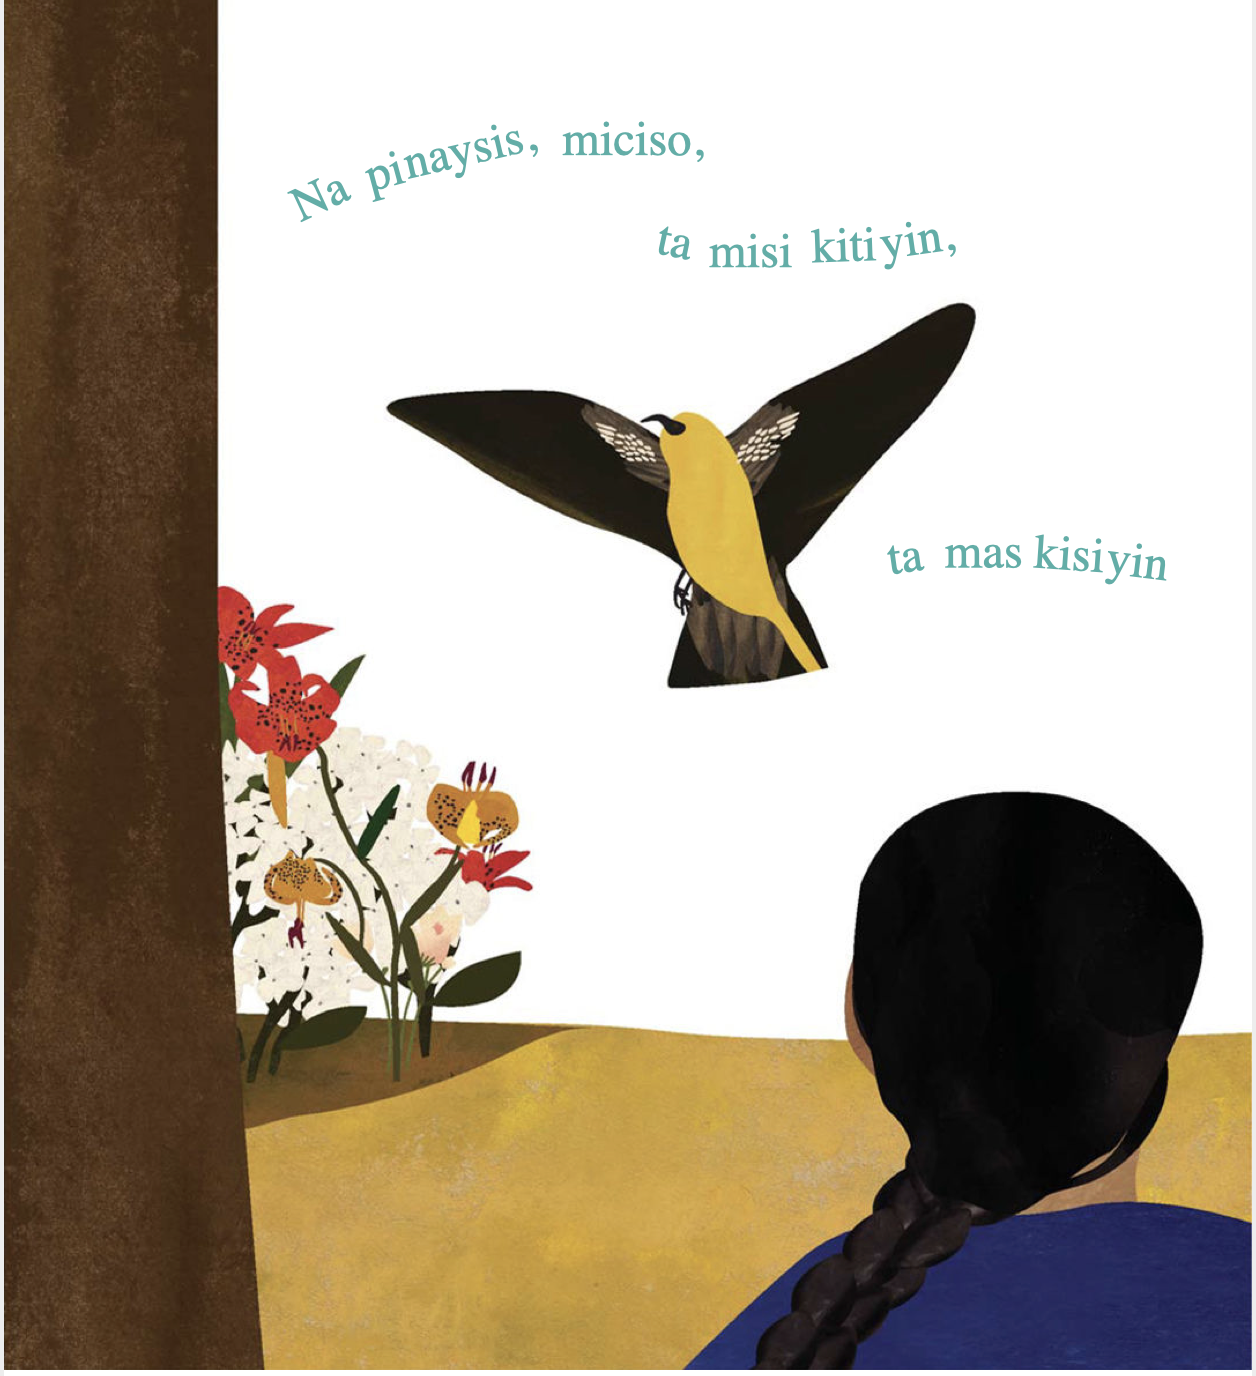 Image taken from screenshot of digital book.